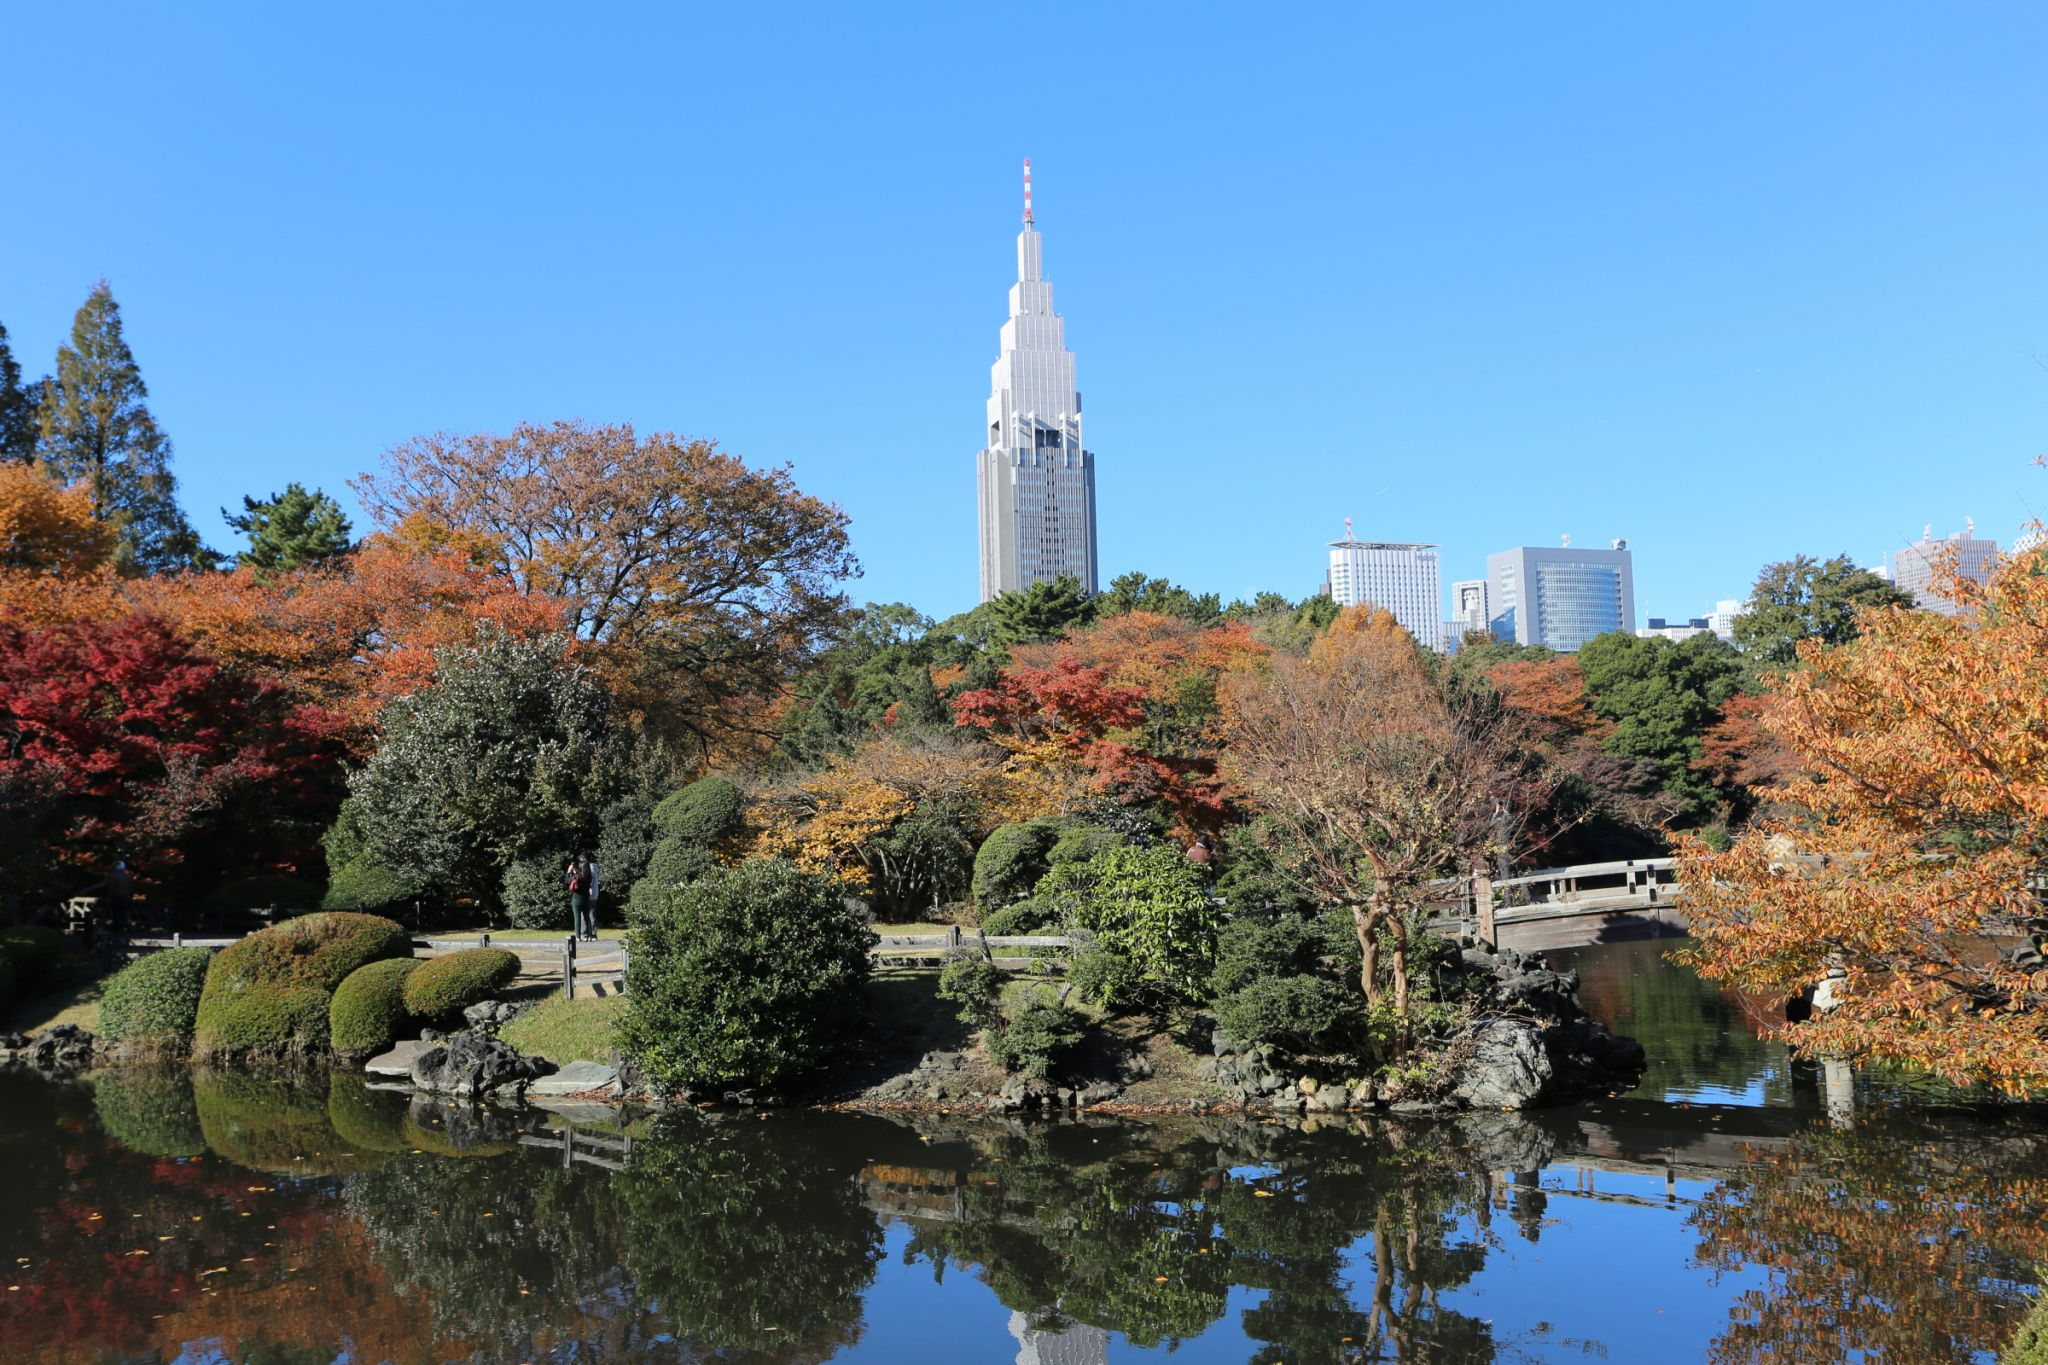 Shinjuku Gyoen Garden, Japan